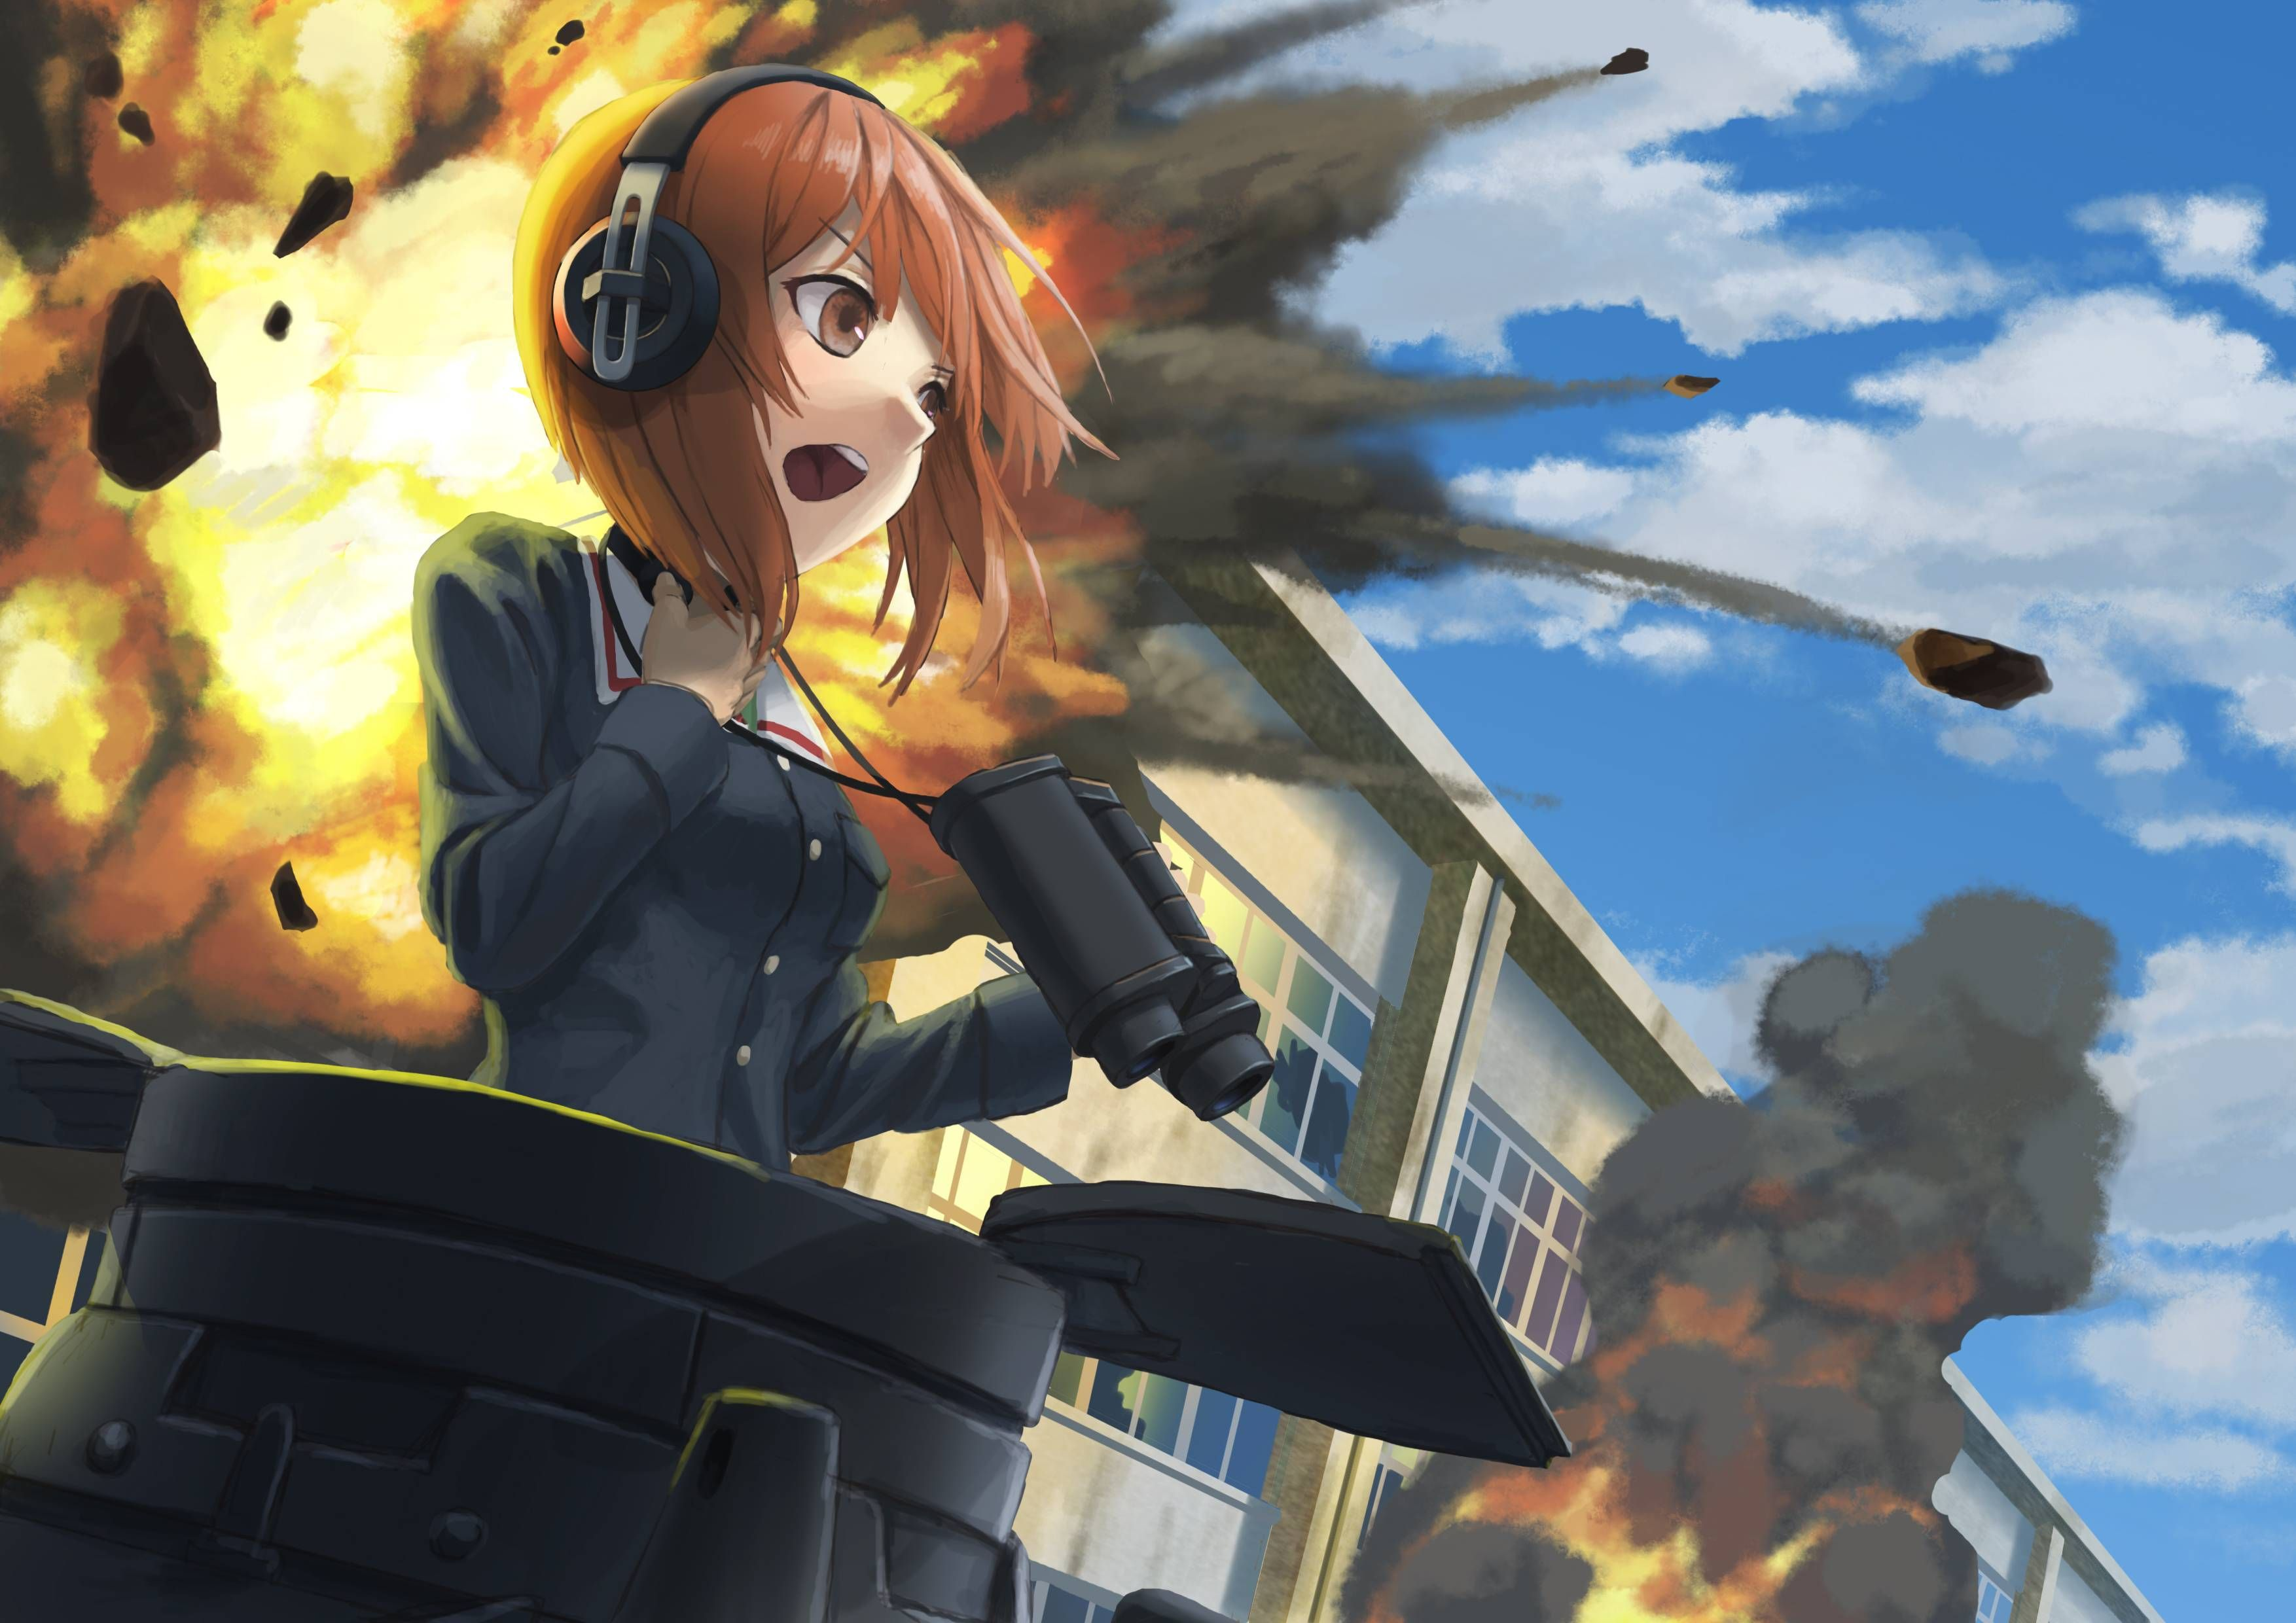 Nishizumi Miho Girls Und Panzer 3508x2480 Hq Backgrounds Hd Wallpapers Gallery Gallsource Com Poster Manga Ebay